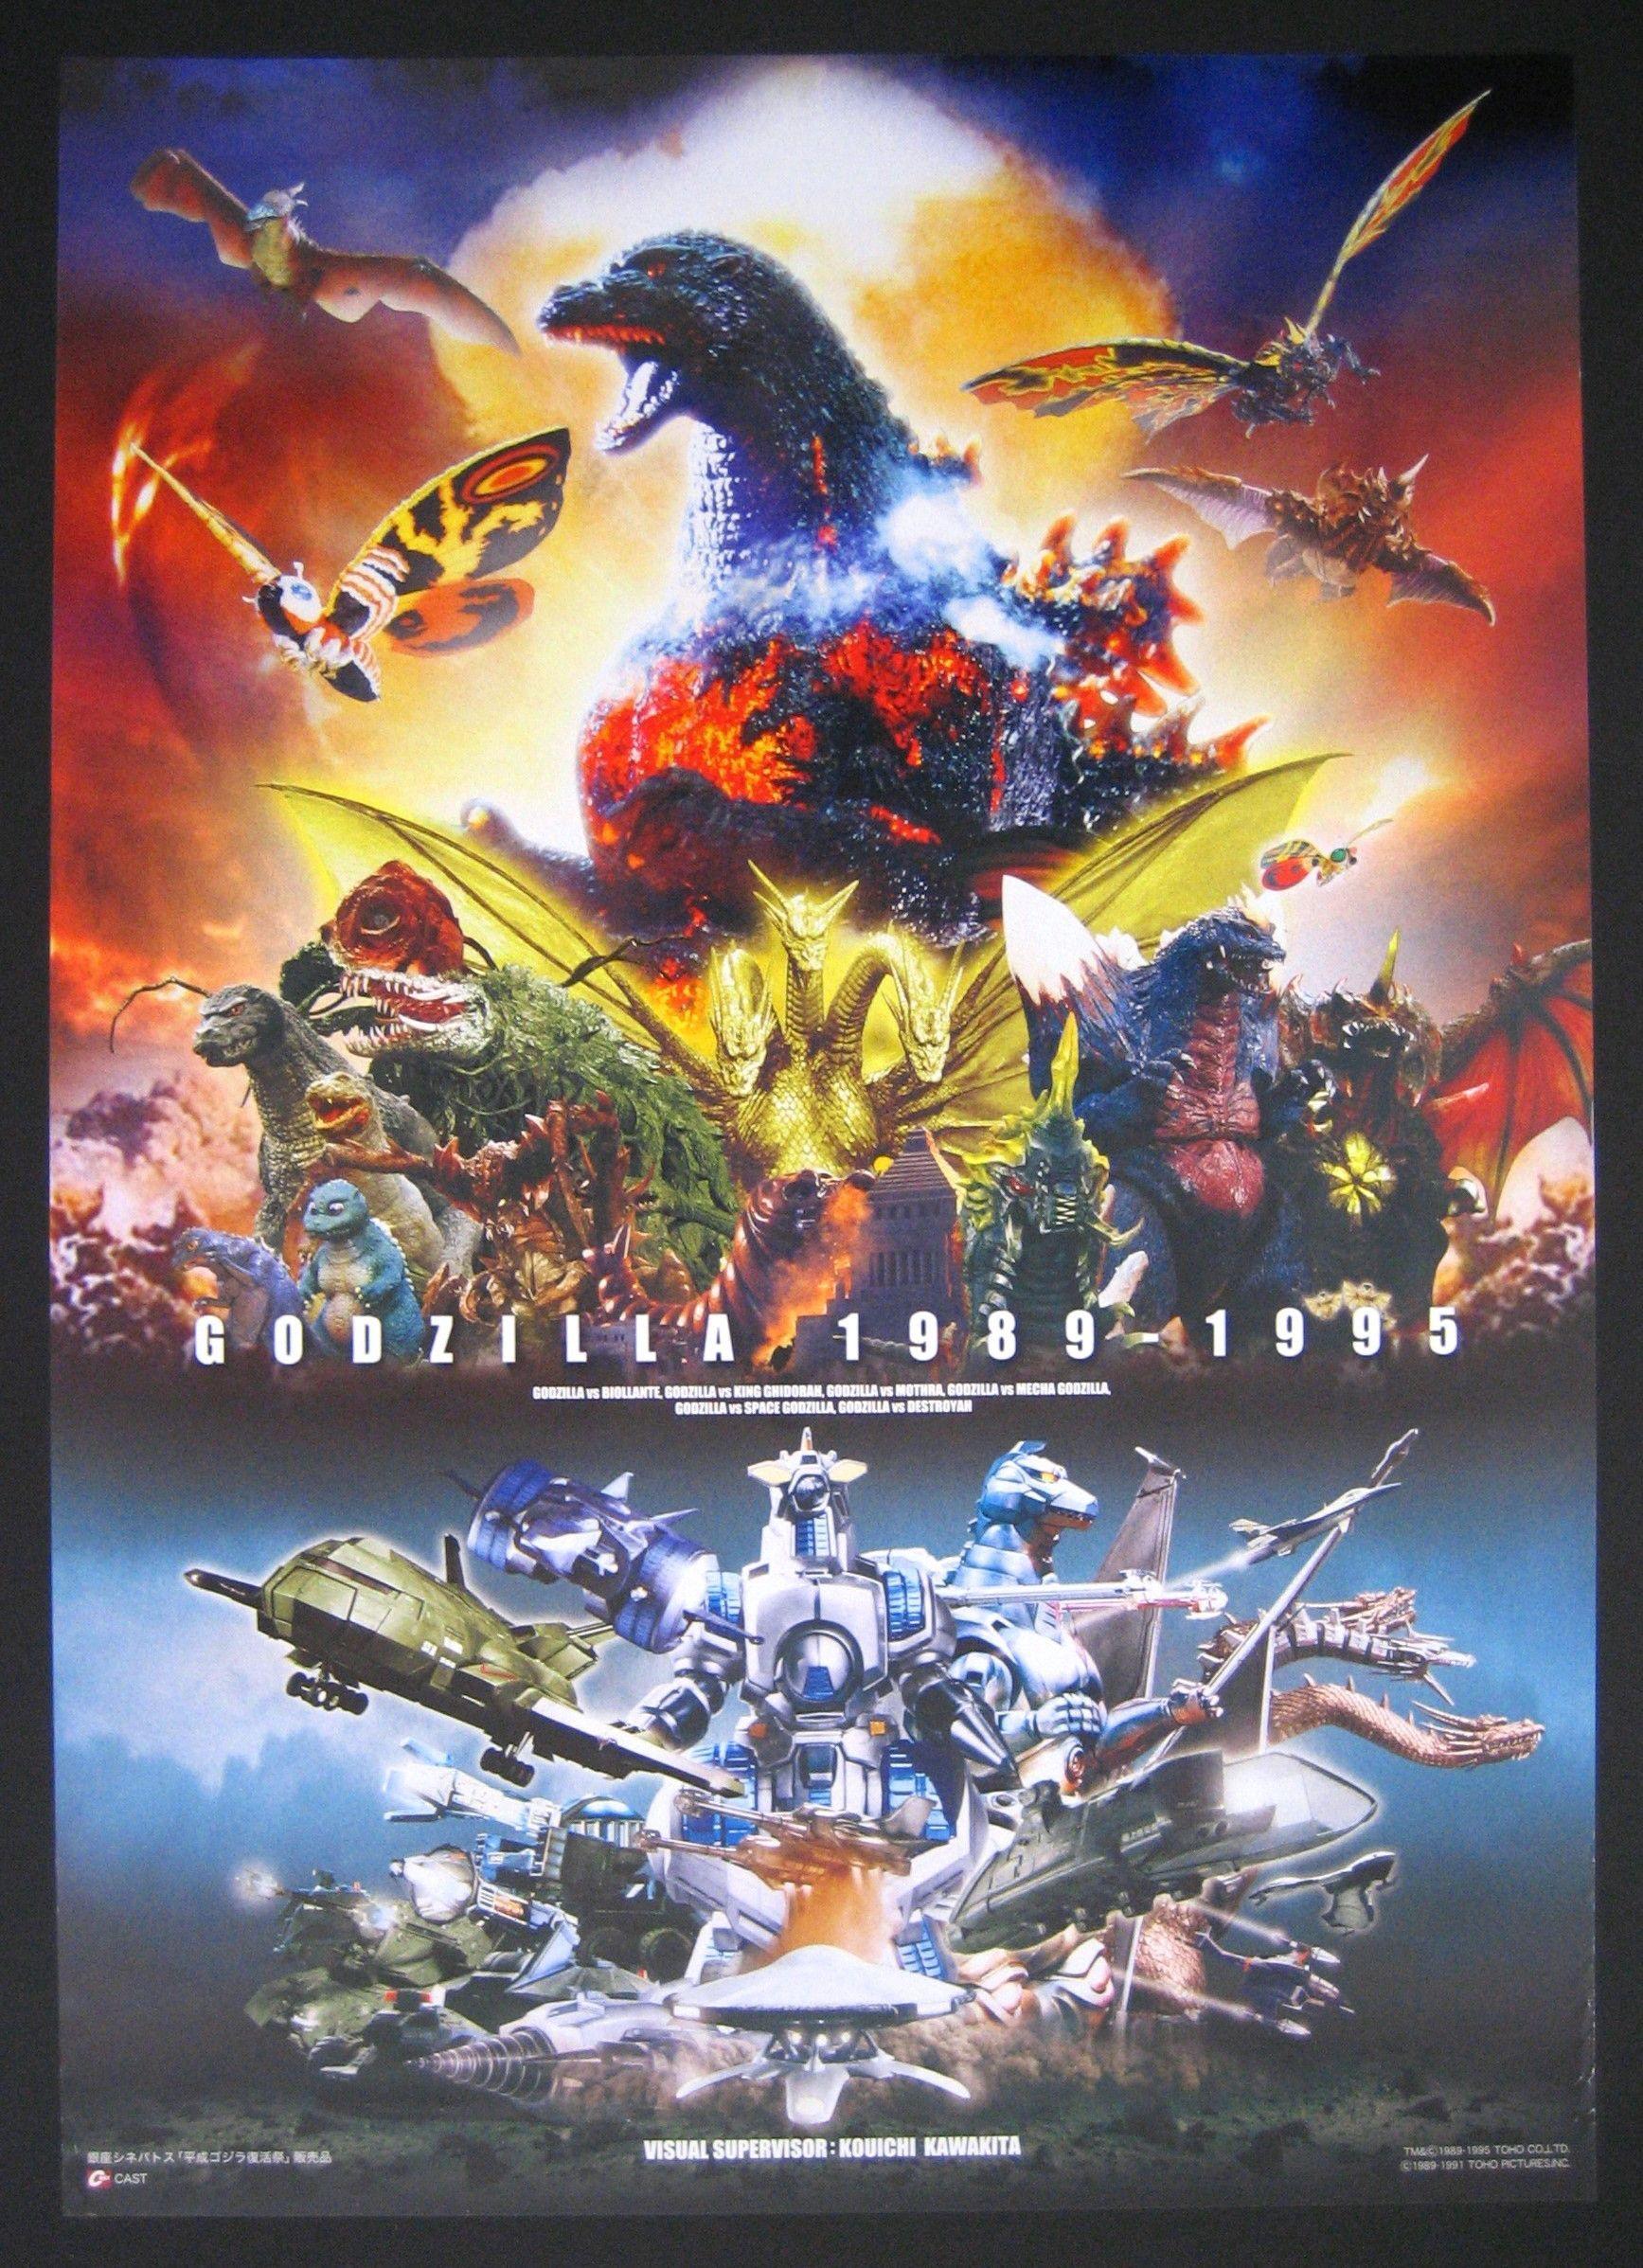 Biollante Godzilla Wallpapers - Wallpaper Cave